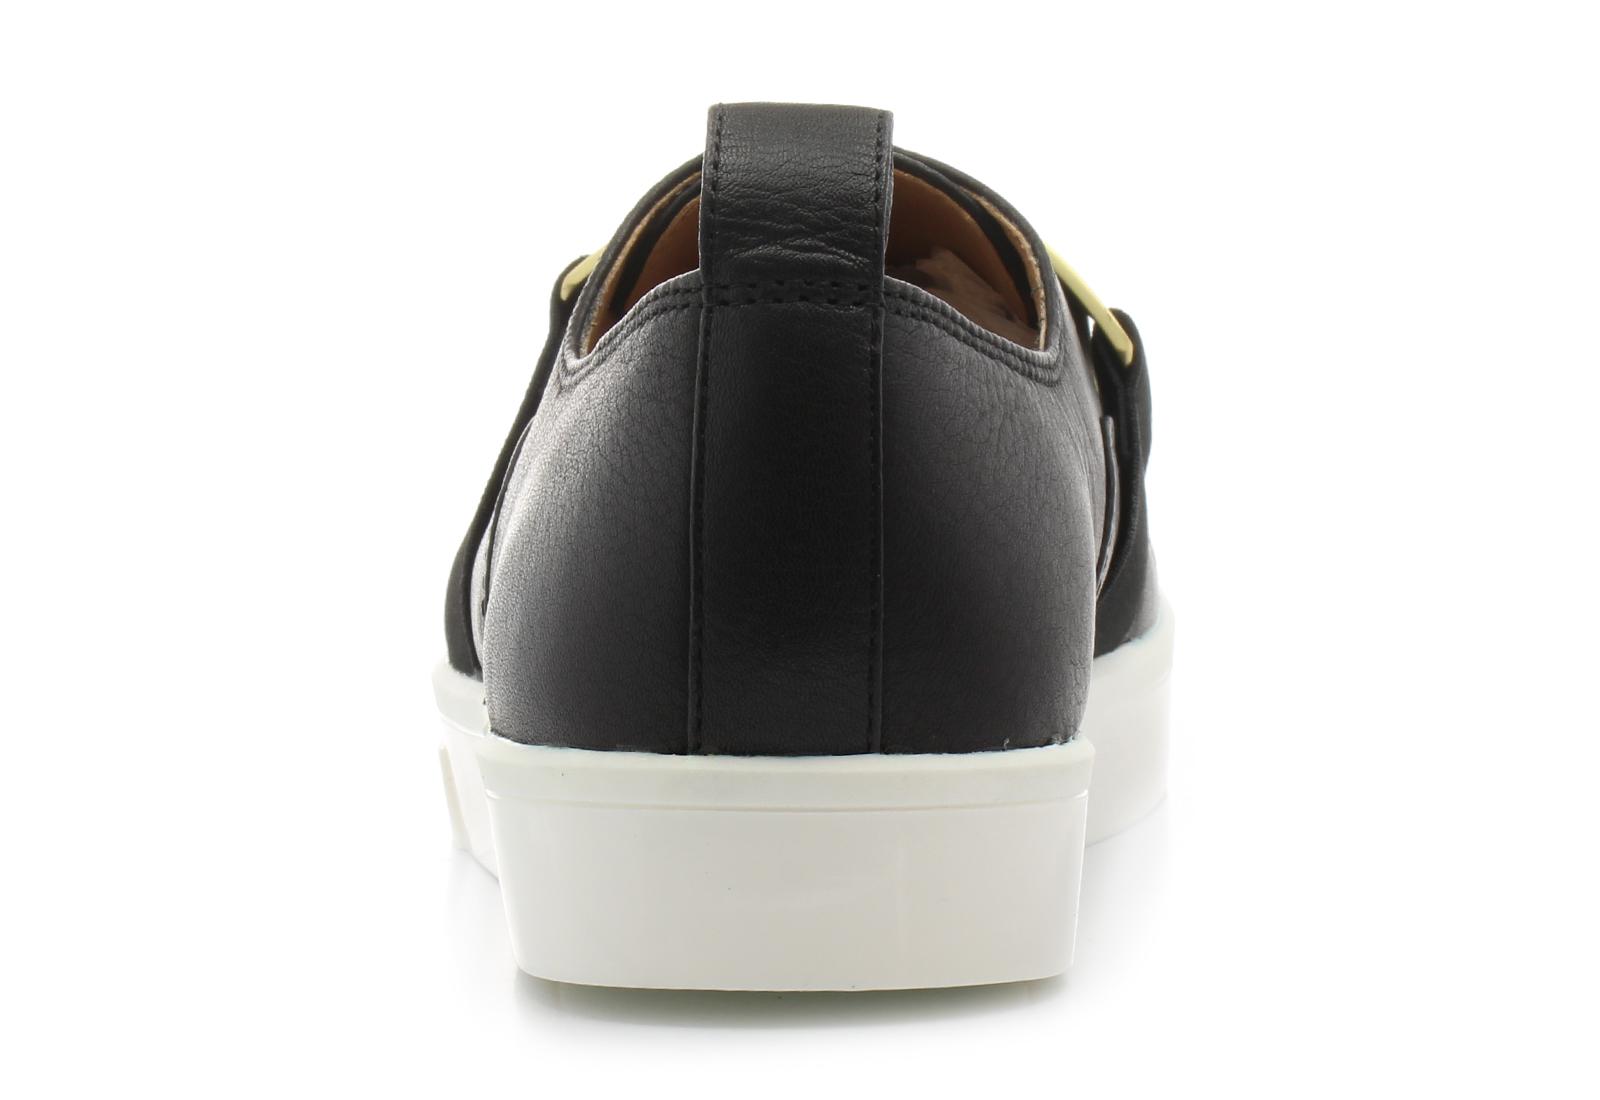 4c71bda6a Calvin Klein Black Label Topánky - Ilona - E5681-BLK - Tenisky ...